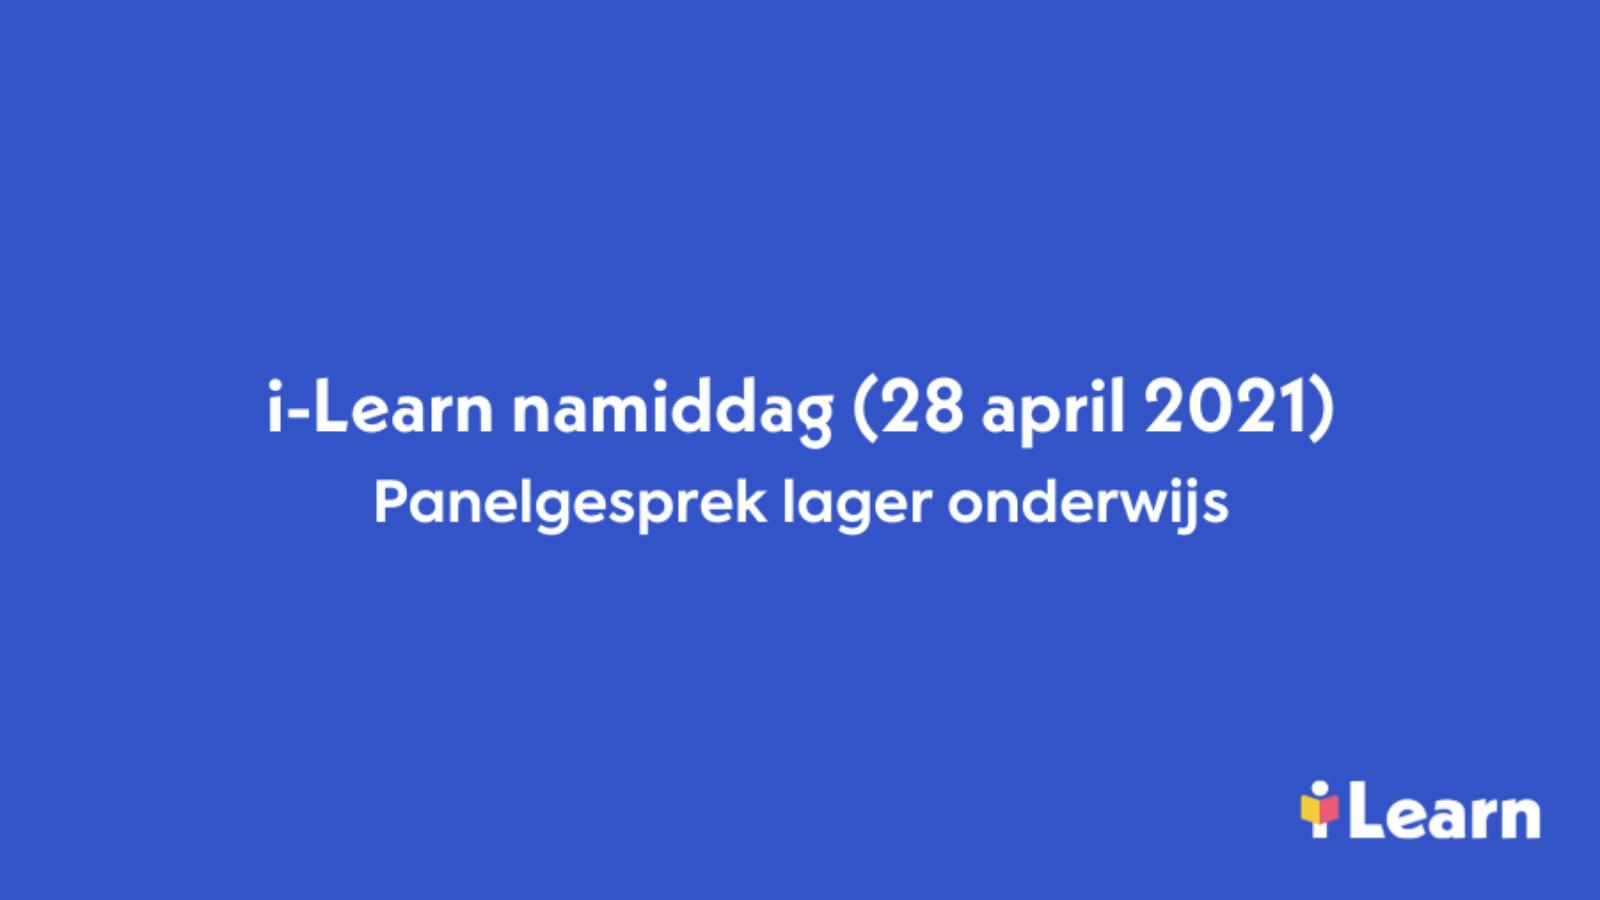 Video panelgesprek lager onderwijs i-Learn namiddag